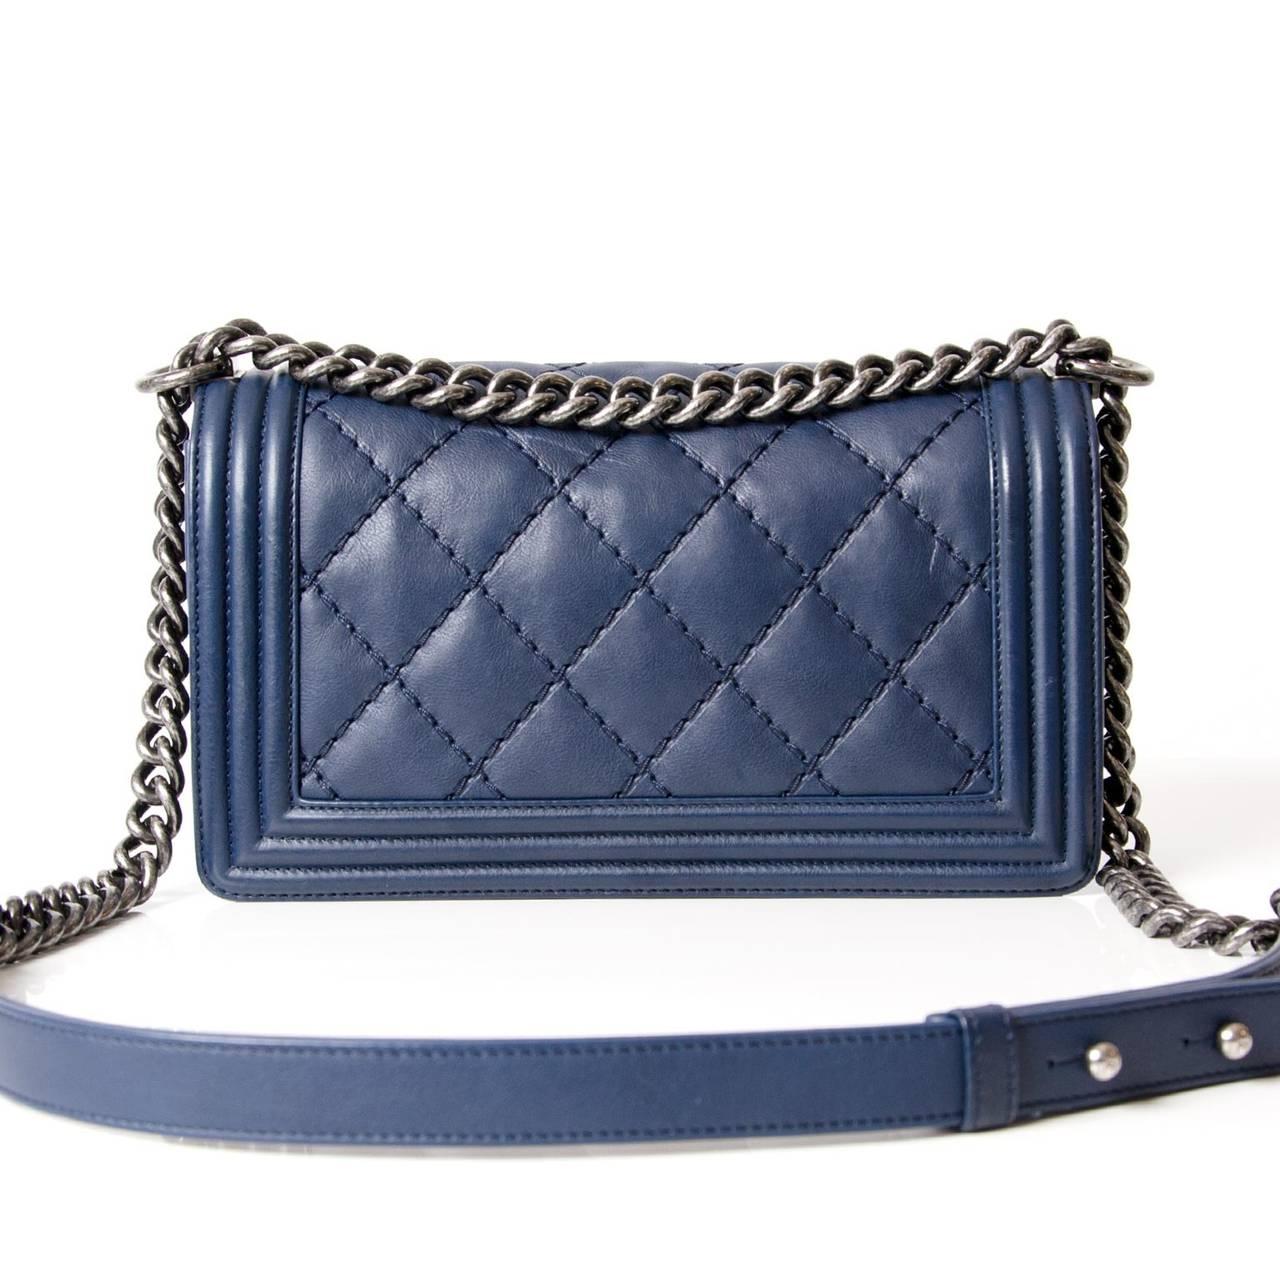 Chanel Lambskin Medium Quilted Boy Bag 4